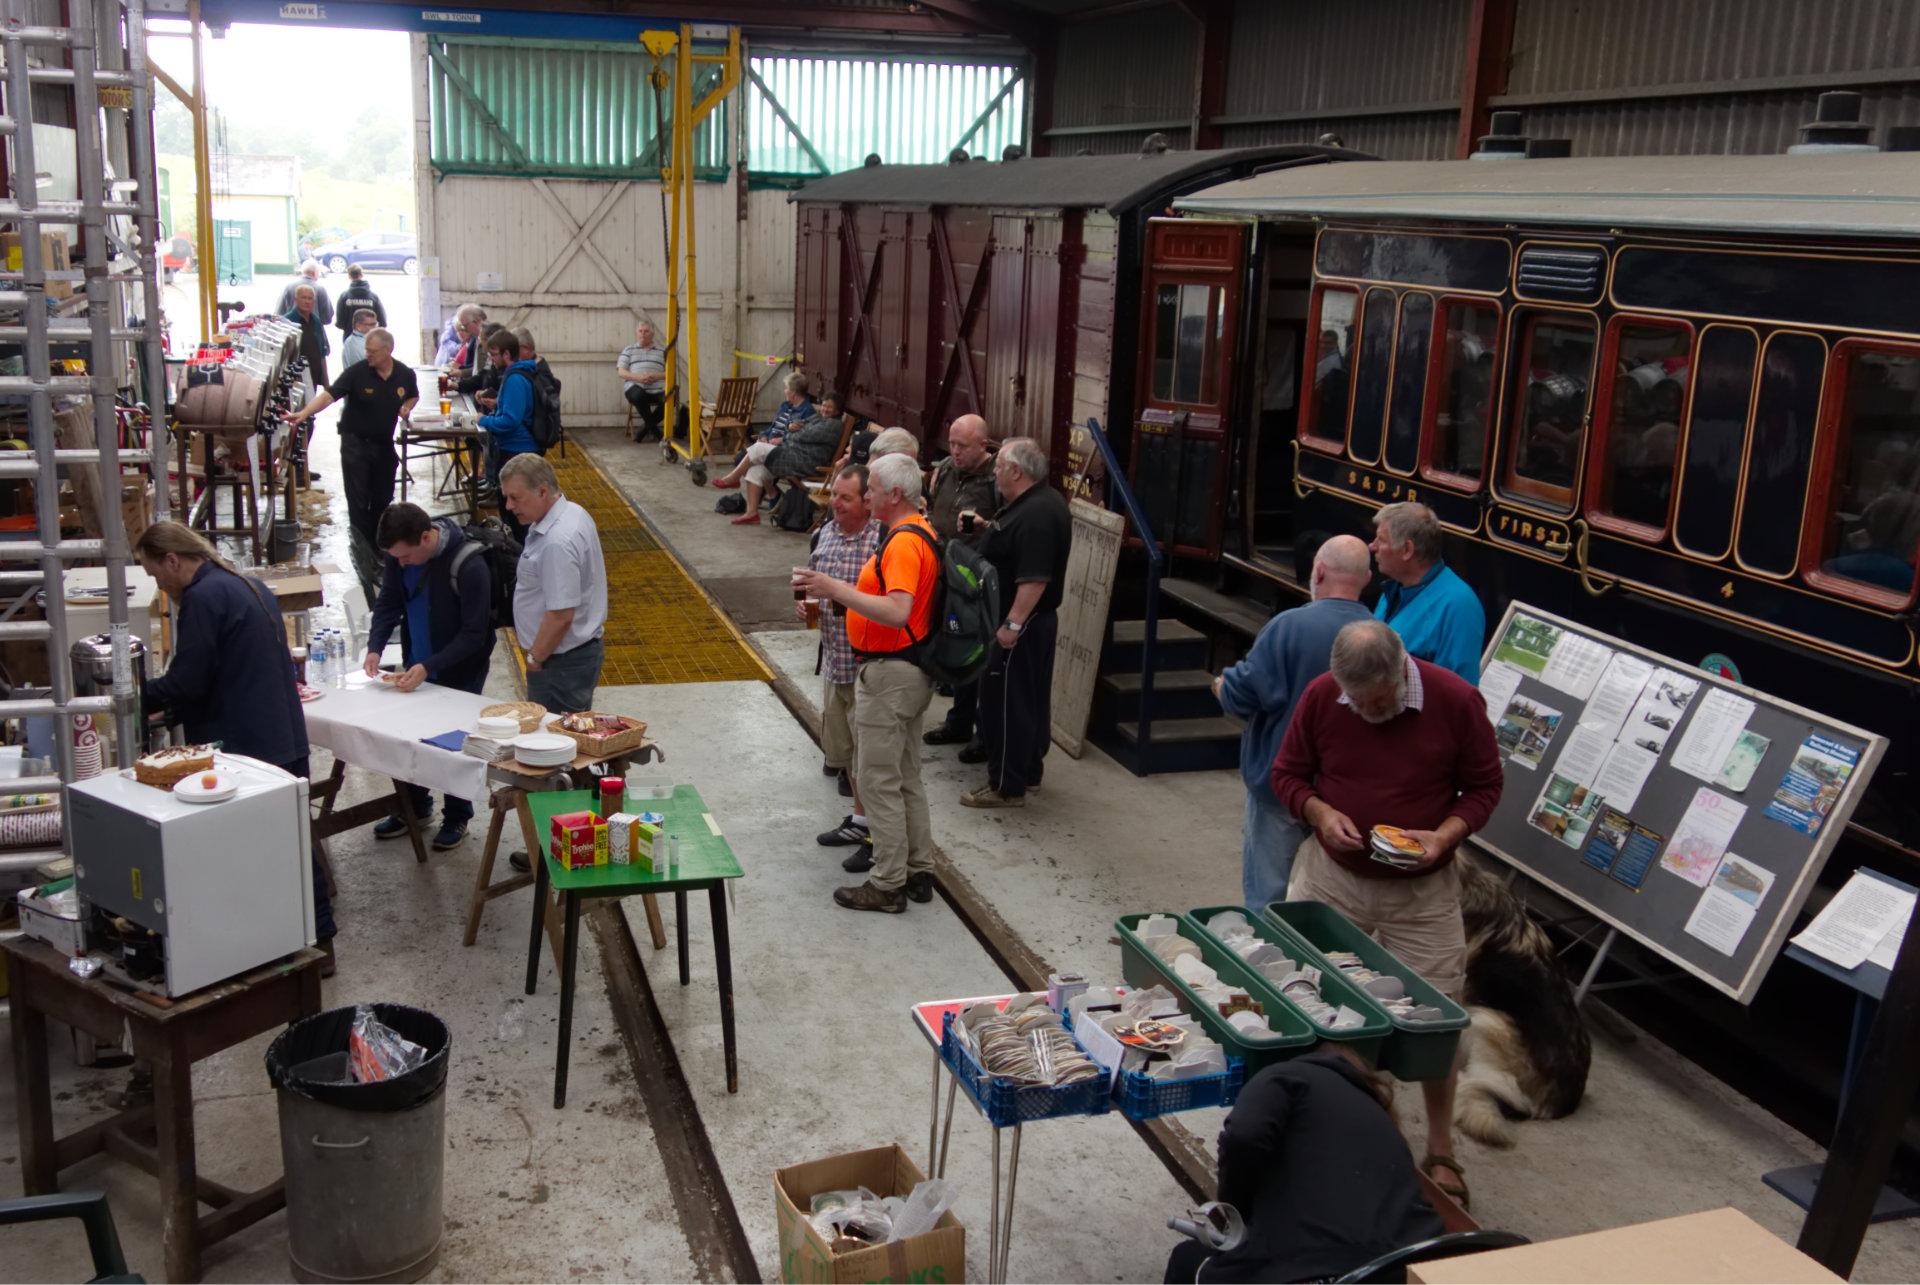 The 2018 Beer Festival, held in the workshops at Washford.